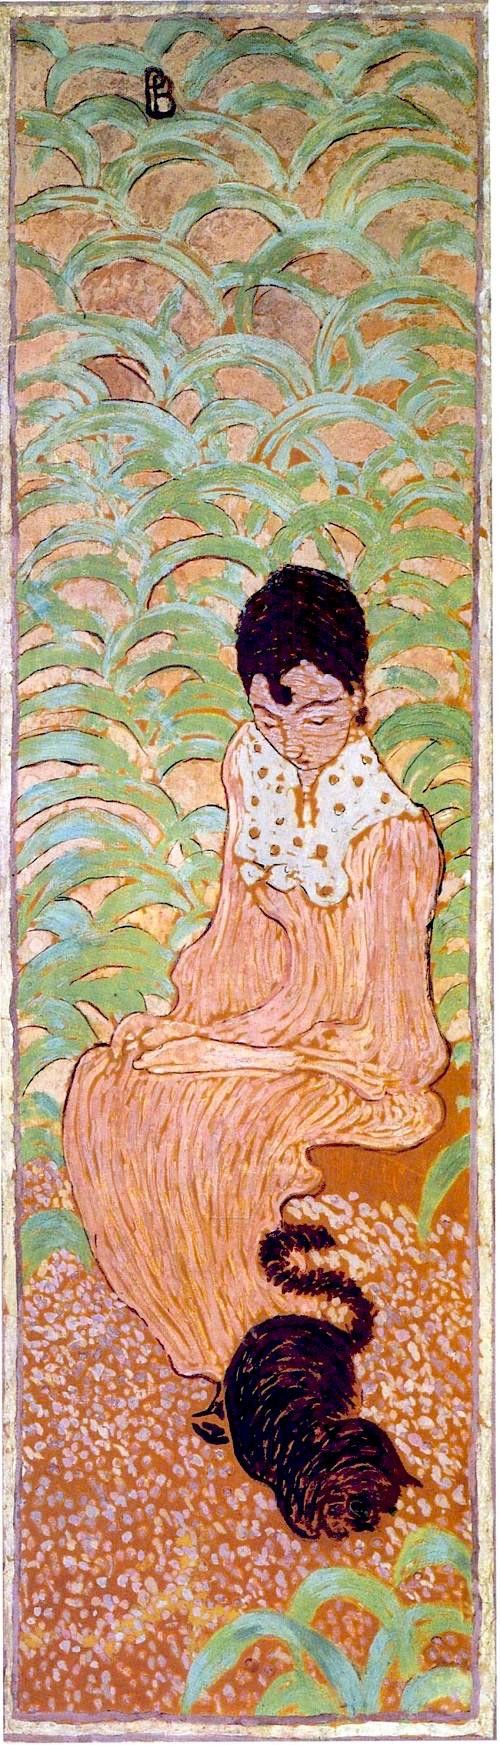 Femmes au jardin : femme assise au chat